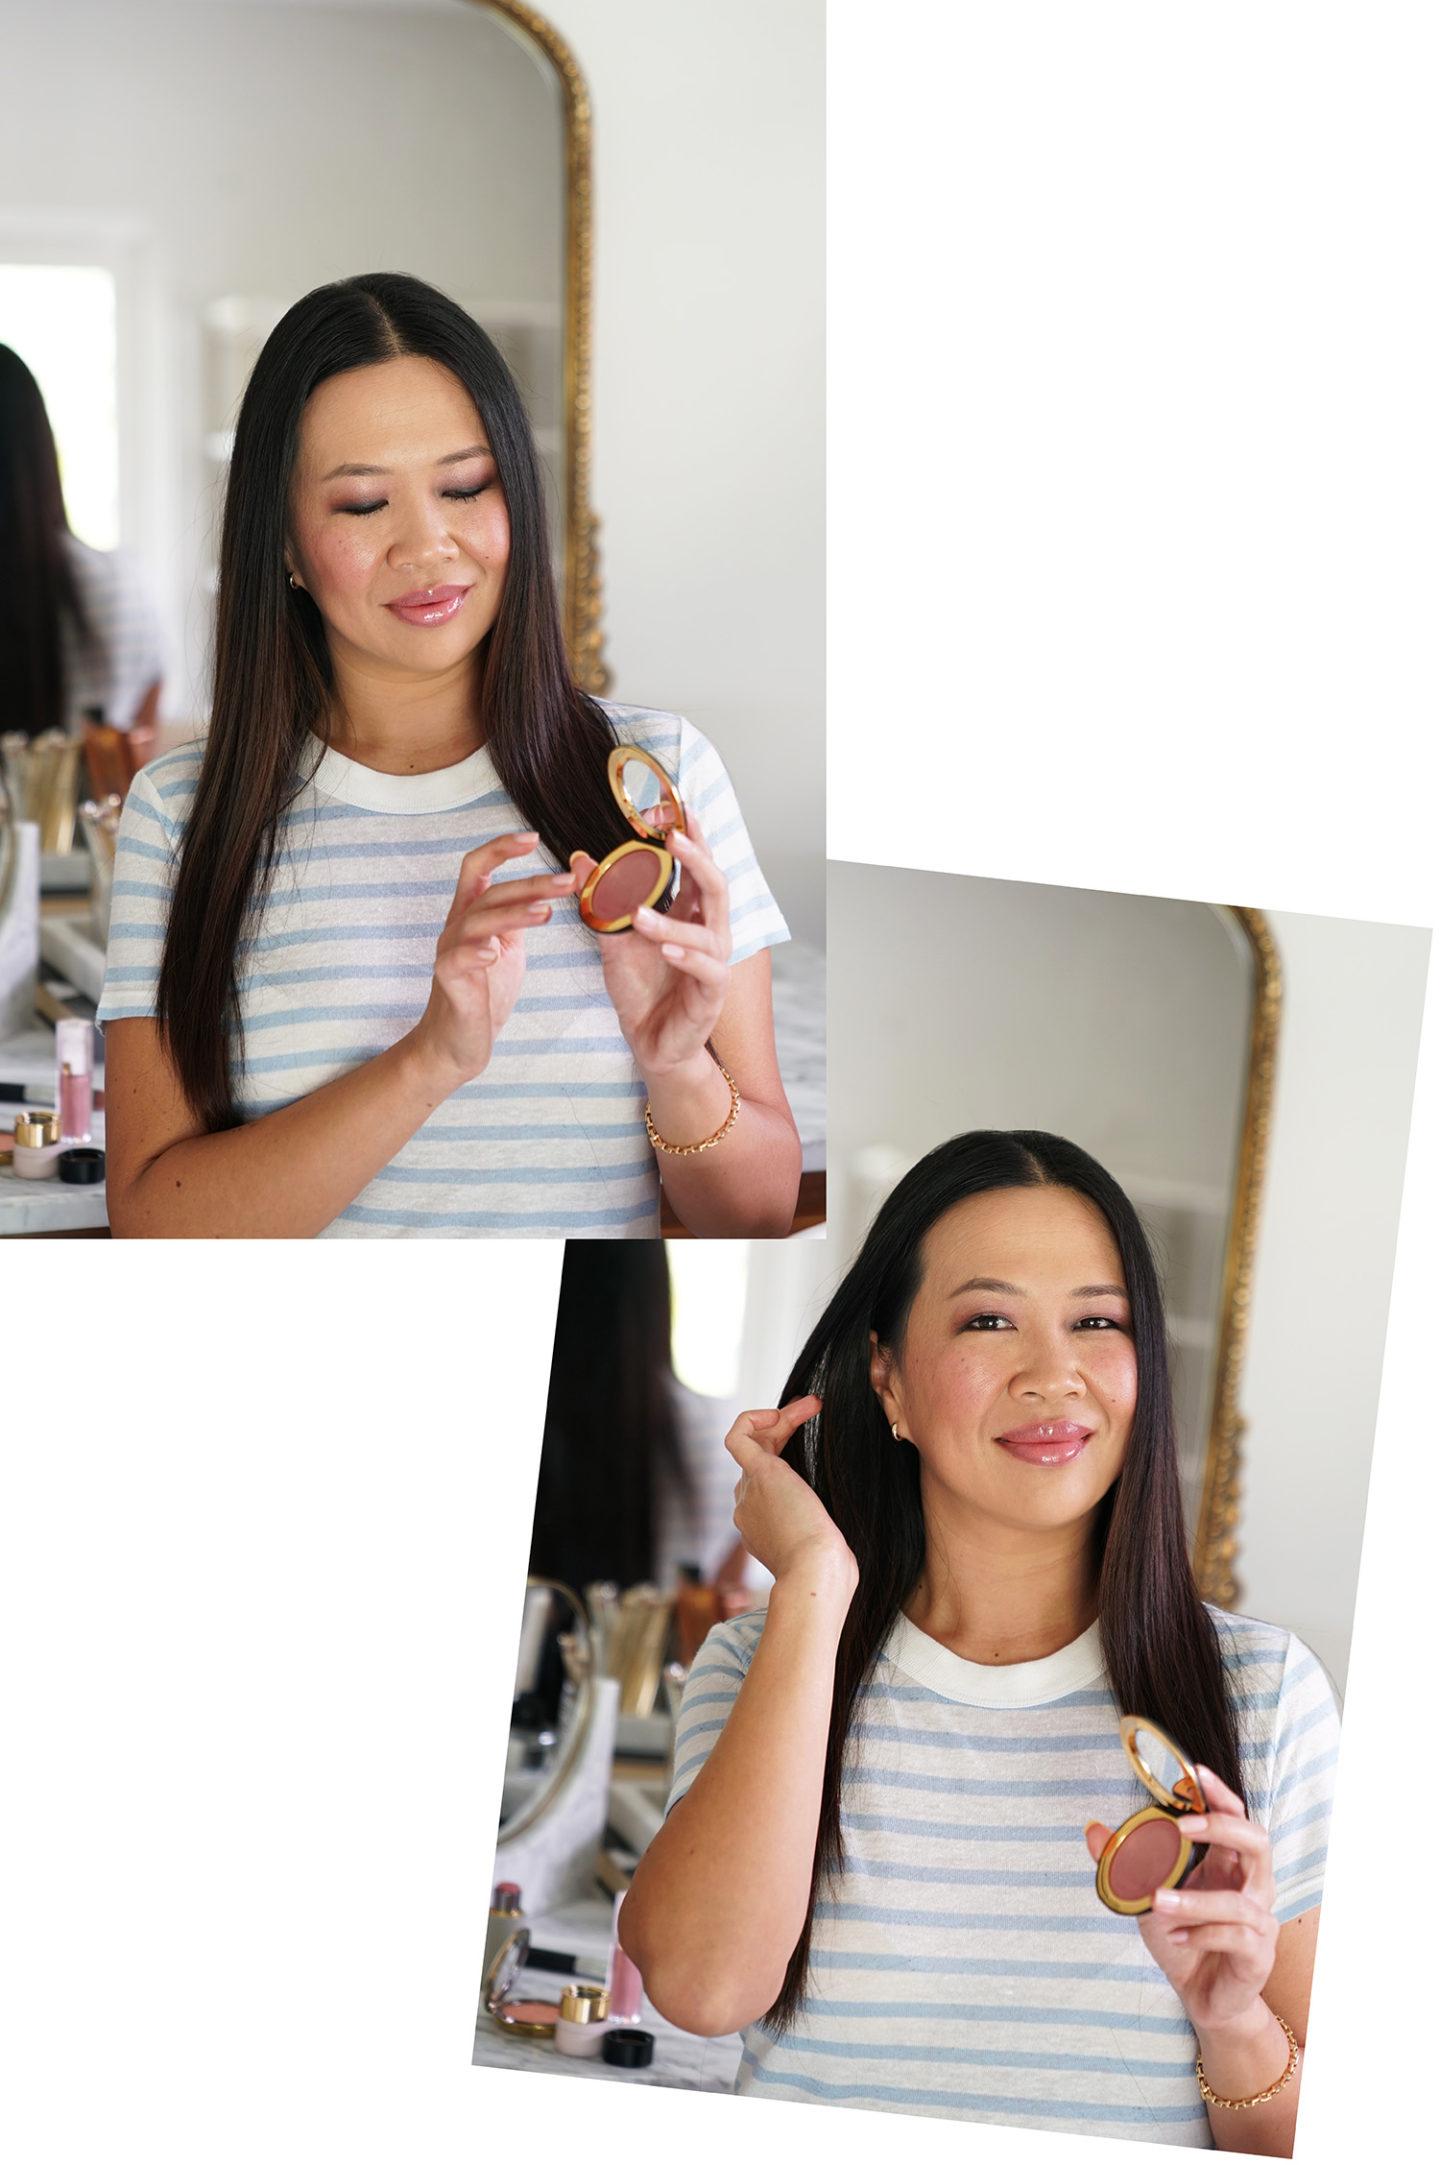 Maquillage Westman Atelier Peau de Rose Super Loaded Tint